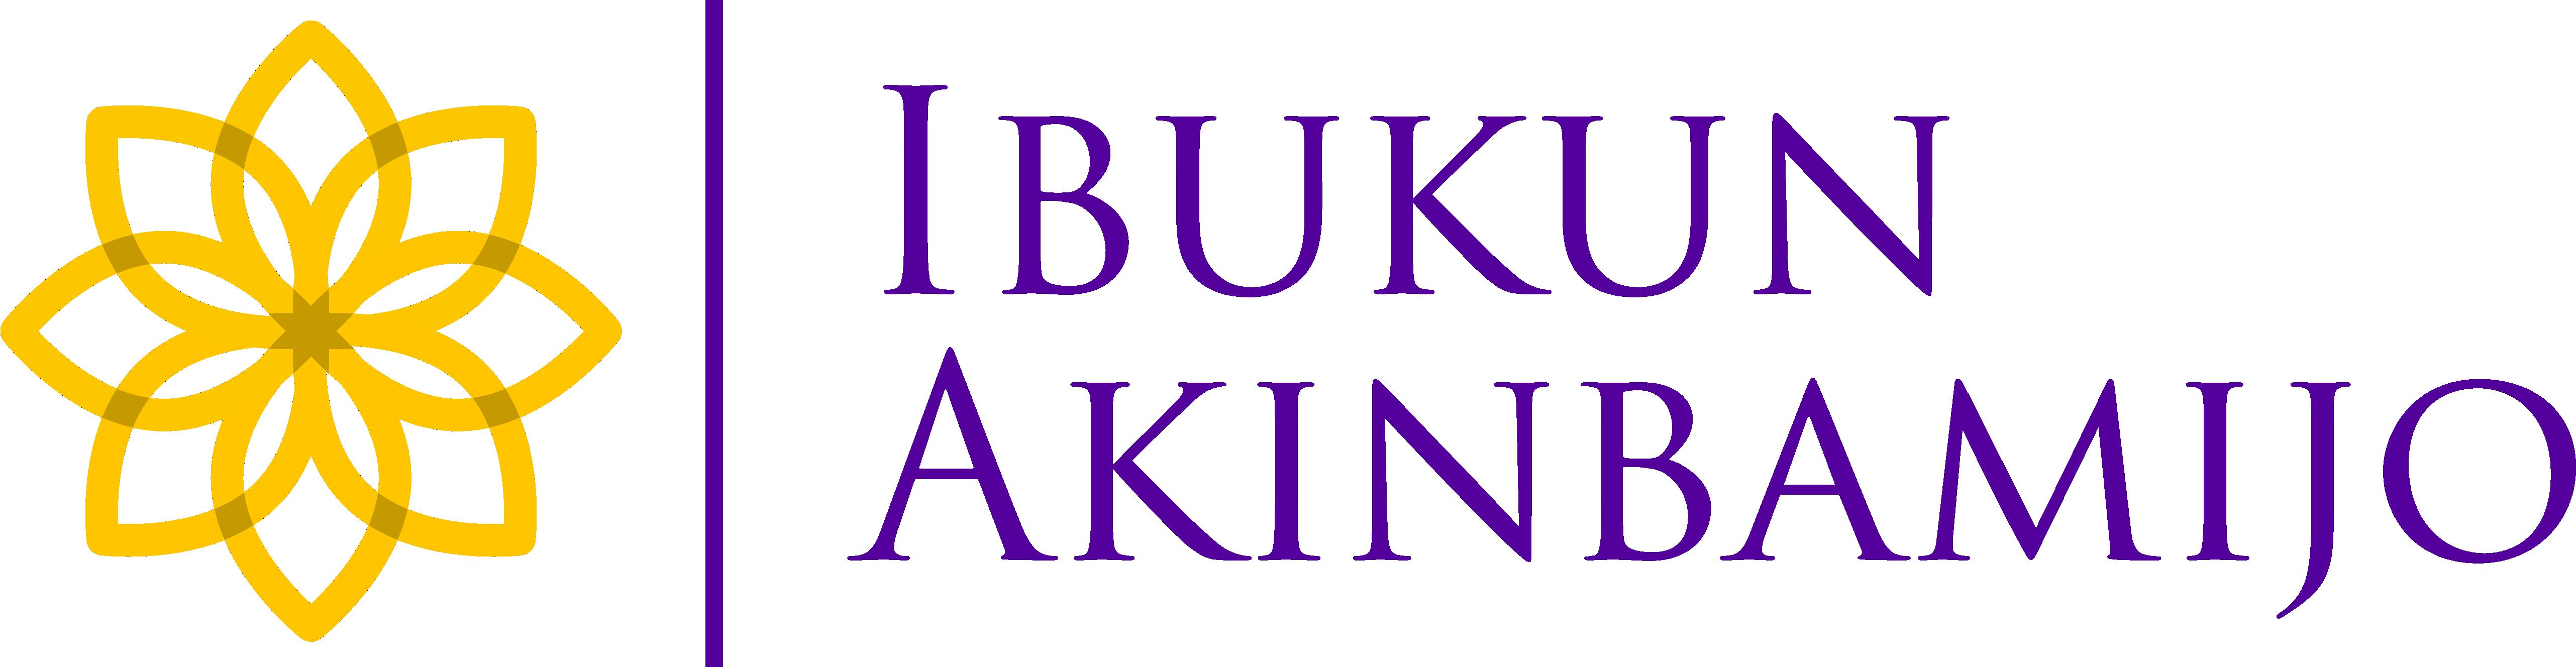 Ibukun Akinbamijo